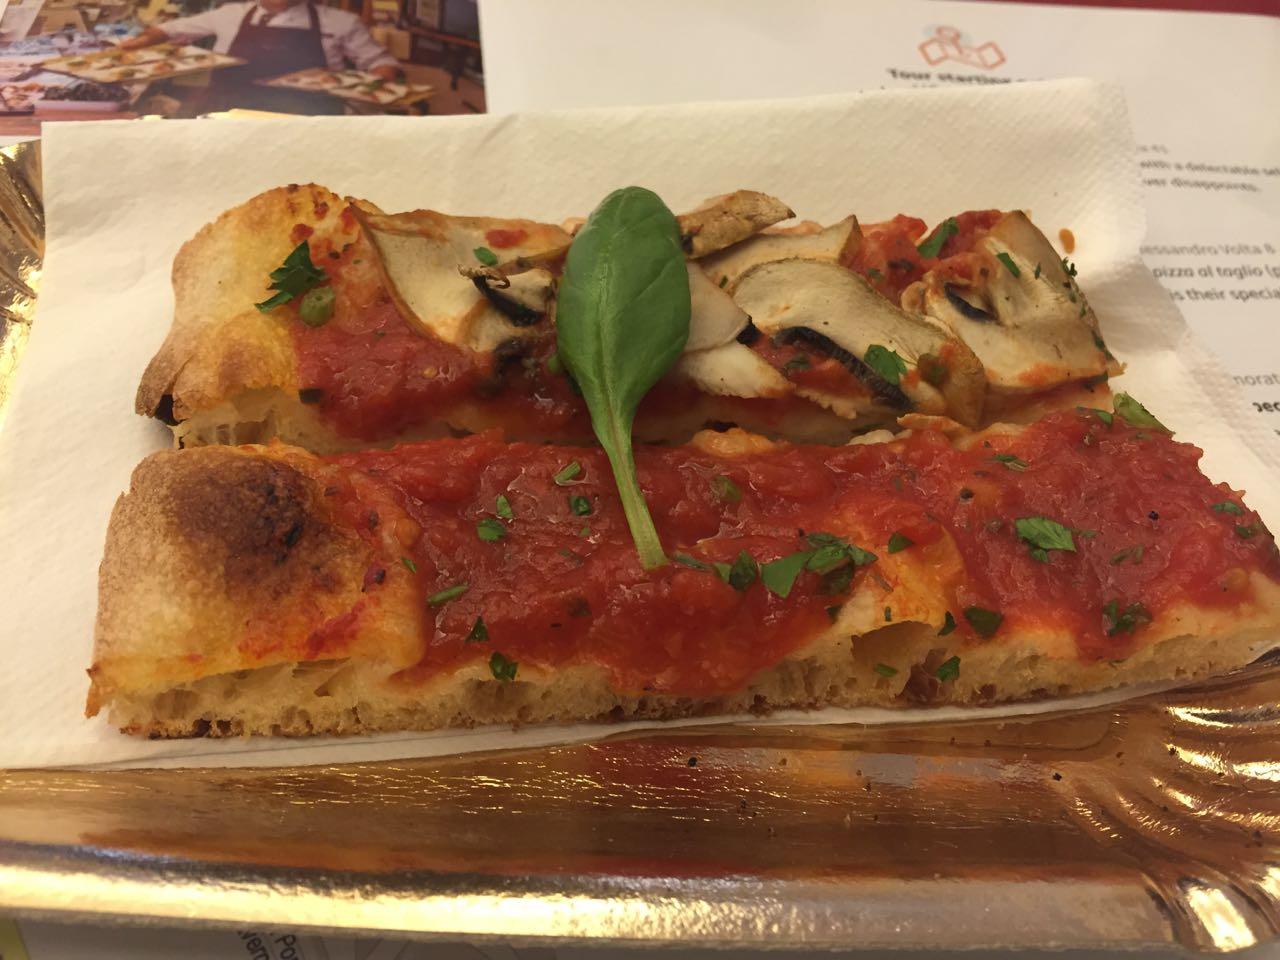 1FTtravel Rome Italy Food Restaurant Tour - Testaccio - Lazio, May 22, 2015 - 4 of 41